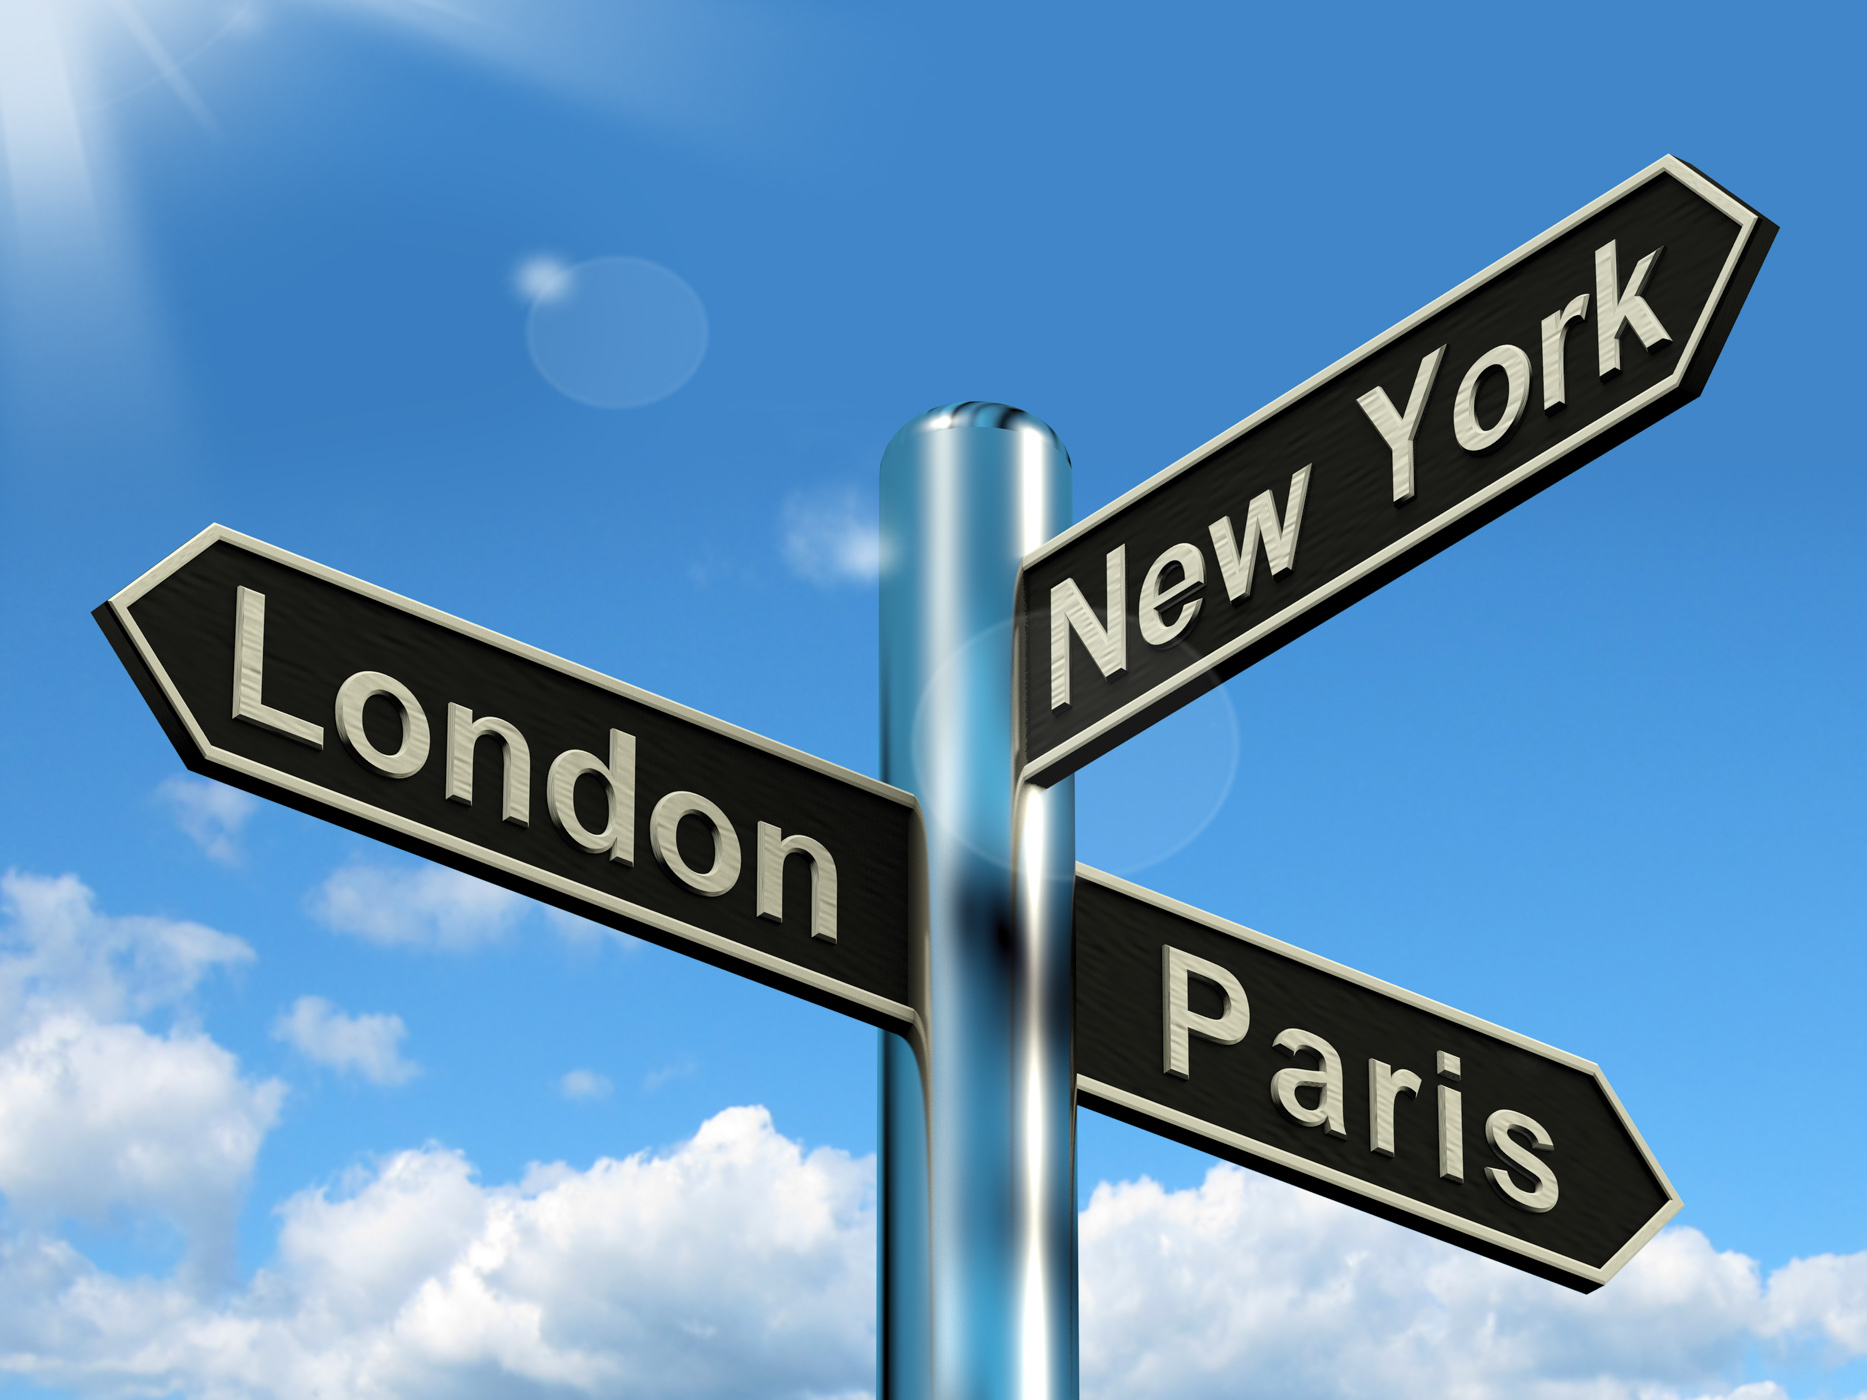 London Paris New York Signpost Showing Travel Tourism And Destinations, Signpost, Sign, Roadsign, Paris, HQ Photo